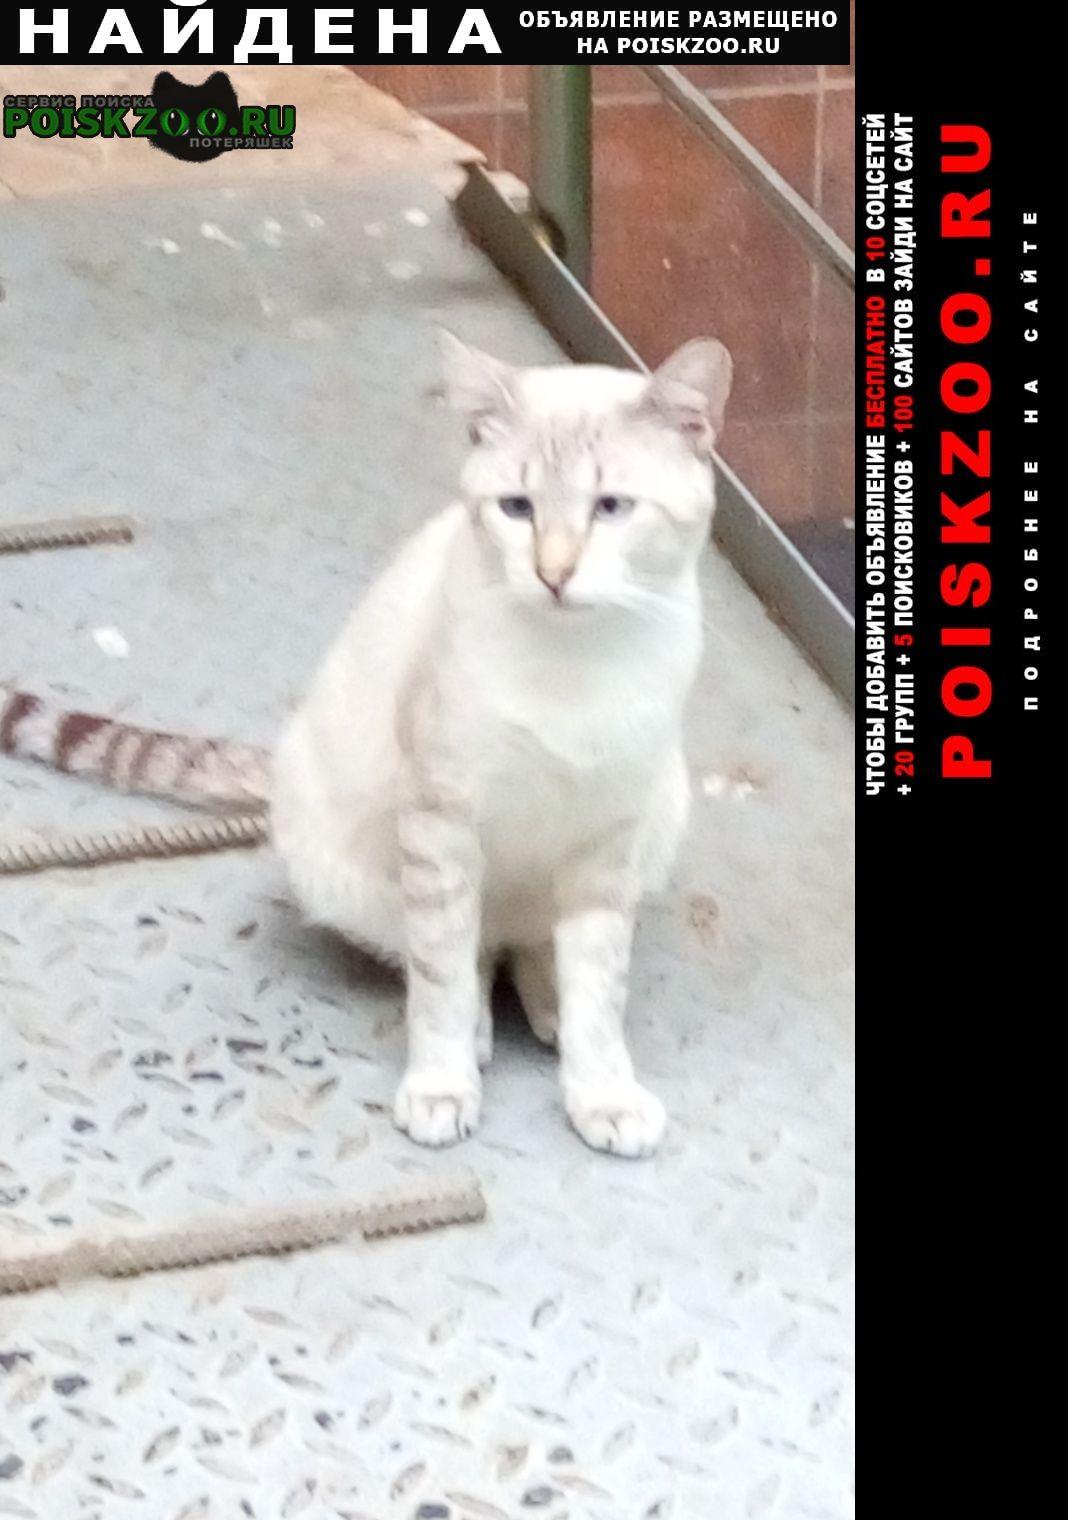 Найден кот фмр Краснодар